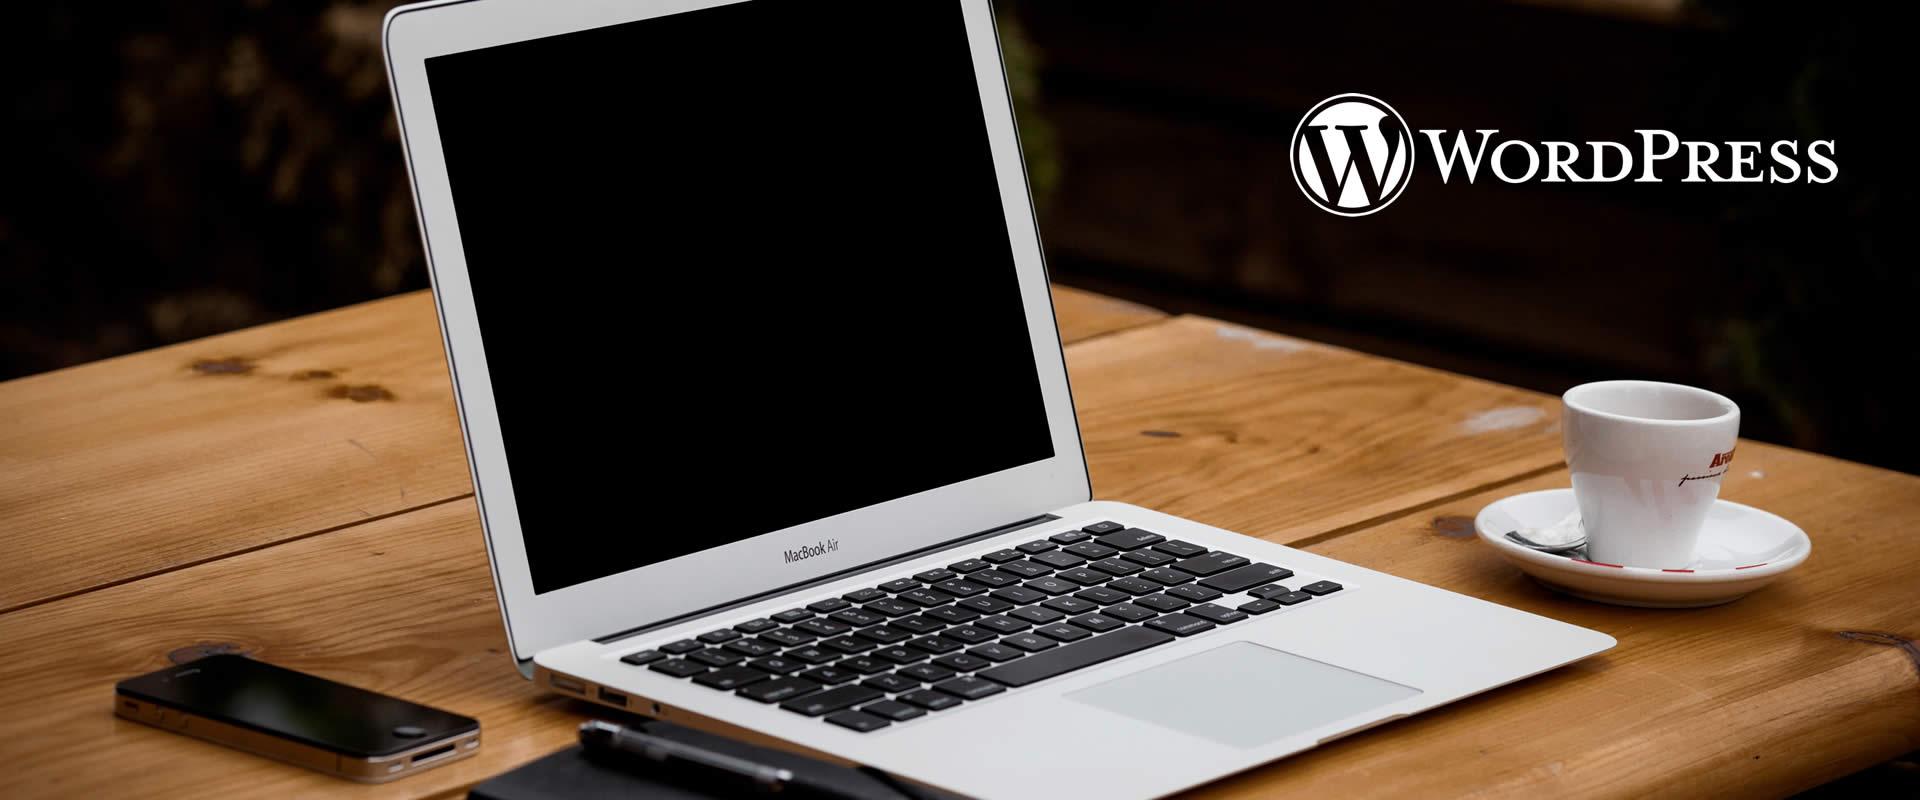 Curso WordPress Uberlândia